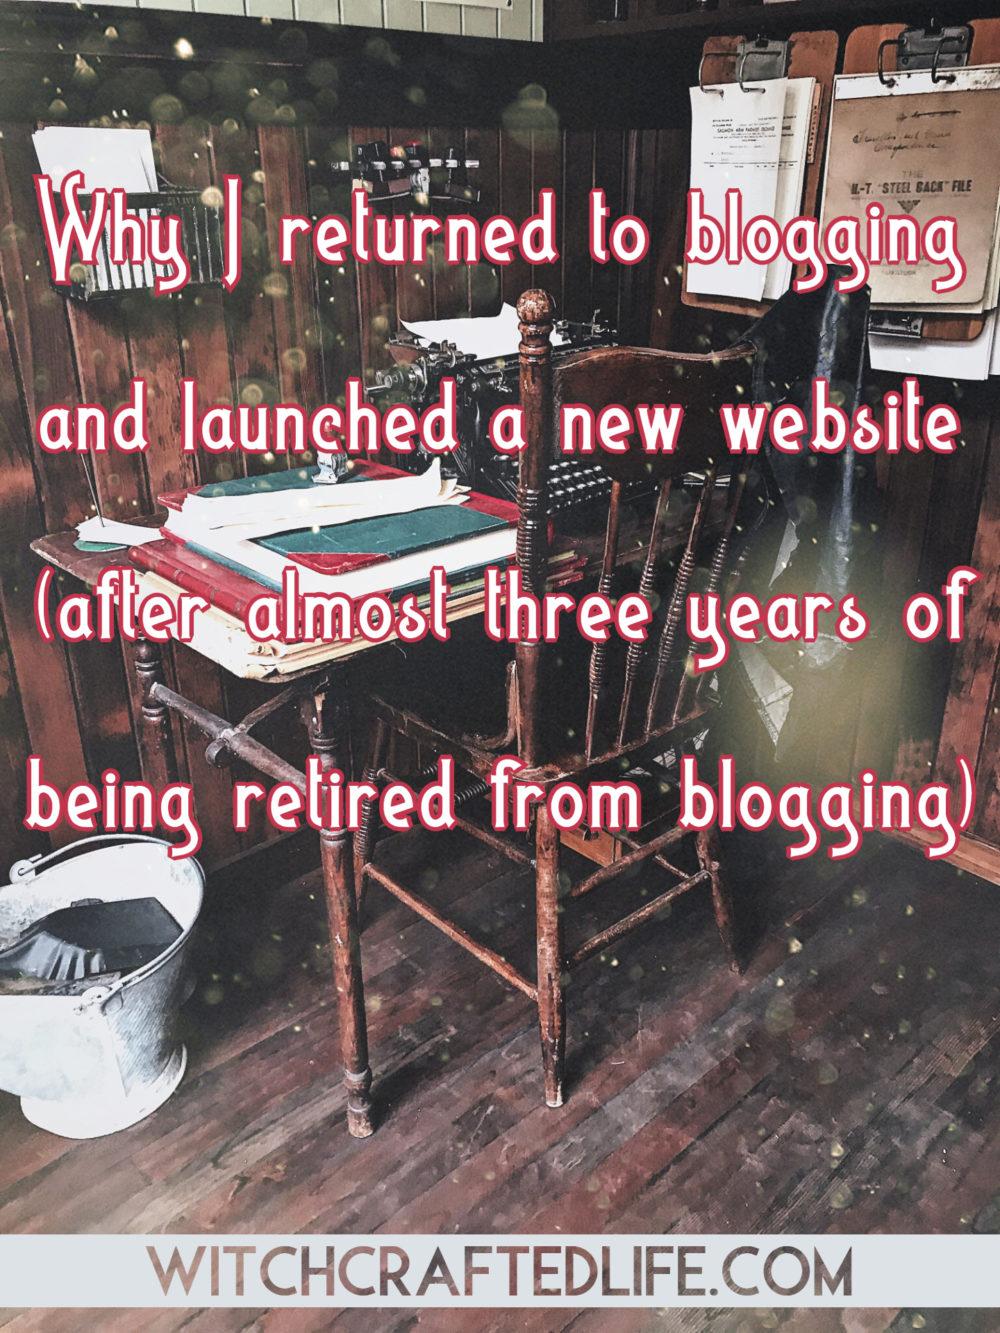 Why I returned to blogging